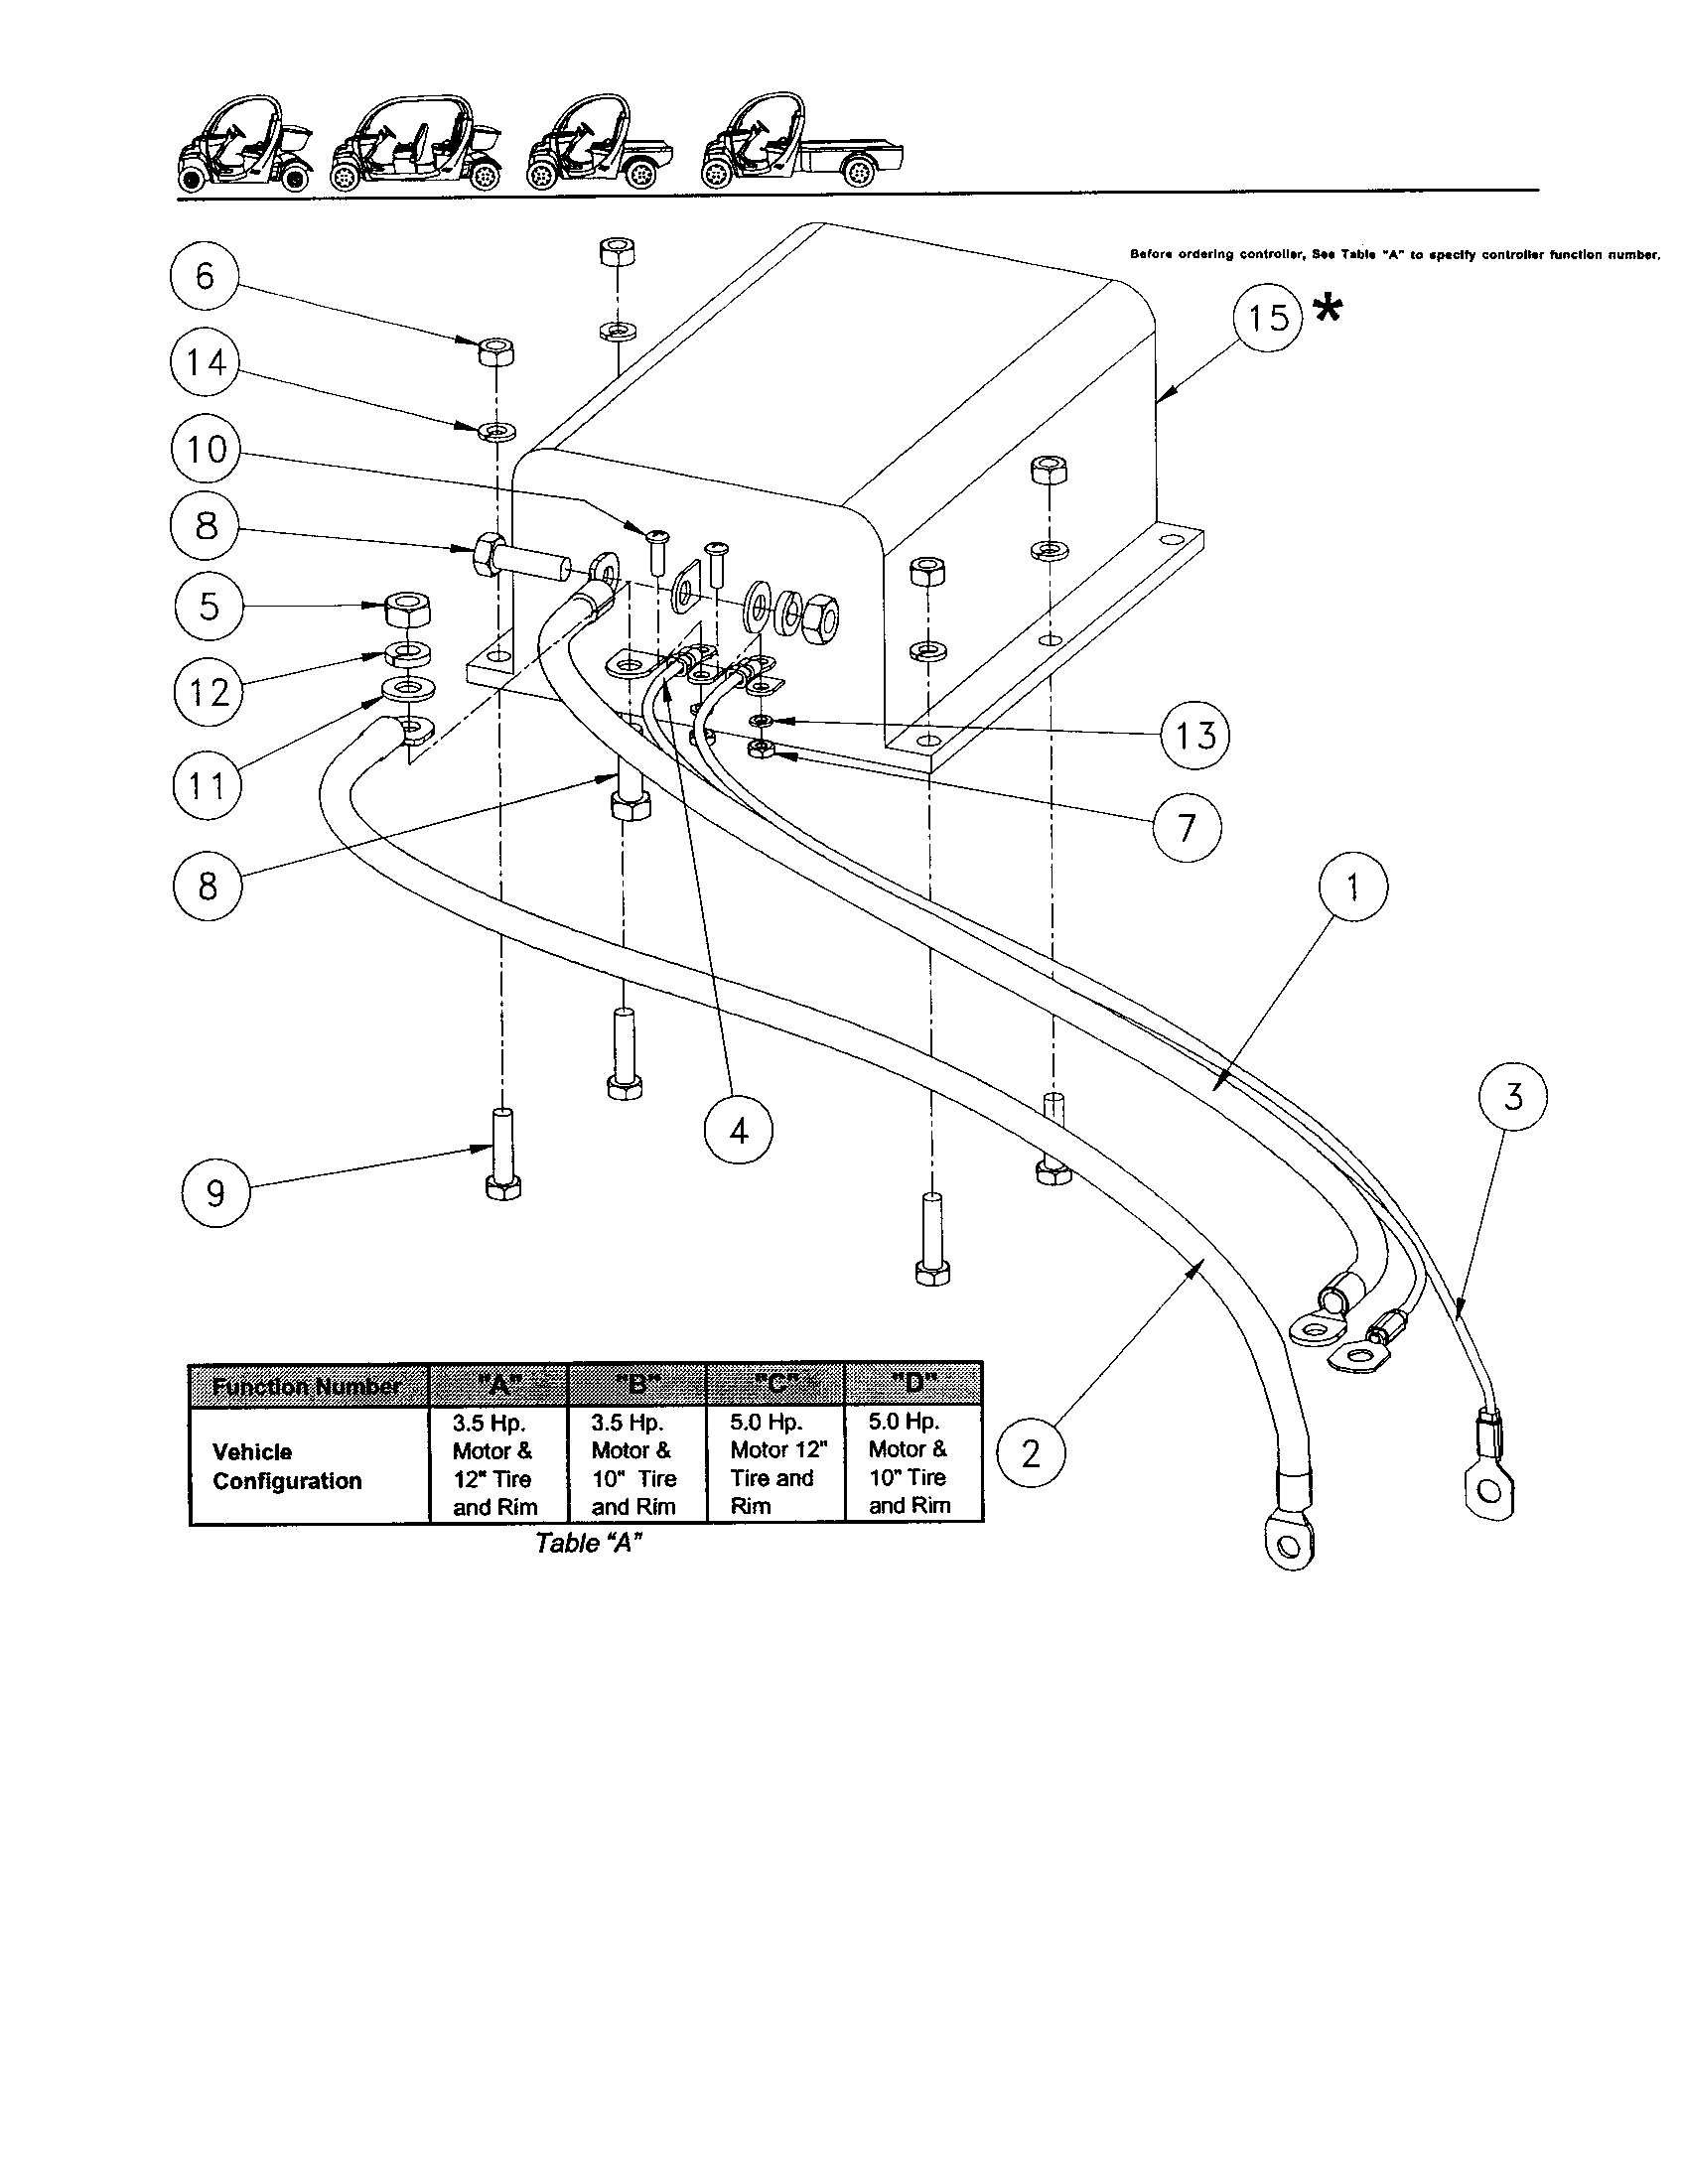 Gem Golf Cart Wiring Diagram - Car Window Motor Wiring Diagram -  tomberlins.tukune.jeanjaures37.fr | Gem Golf Car Wiring Diagram |  | Wiring Diagram Resource